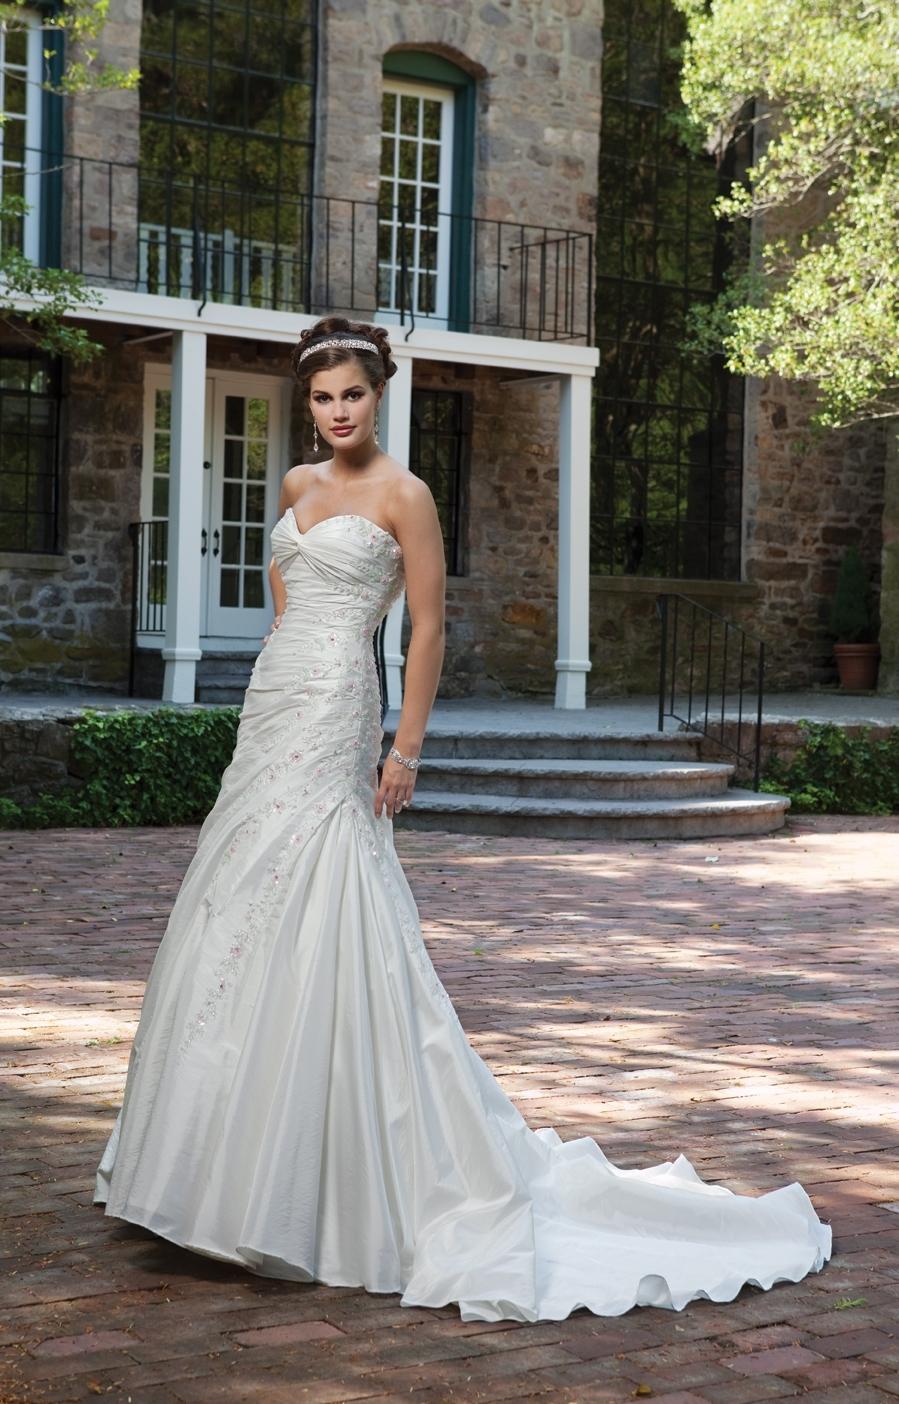 I231103-spring-2011-wedding-dress-kathy-ireland-for-2bebride.full